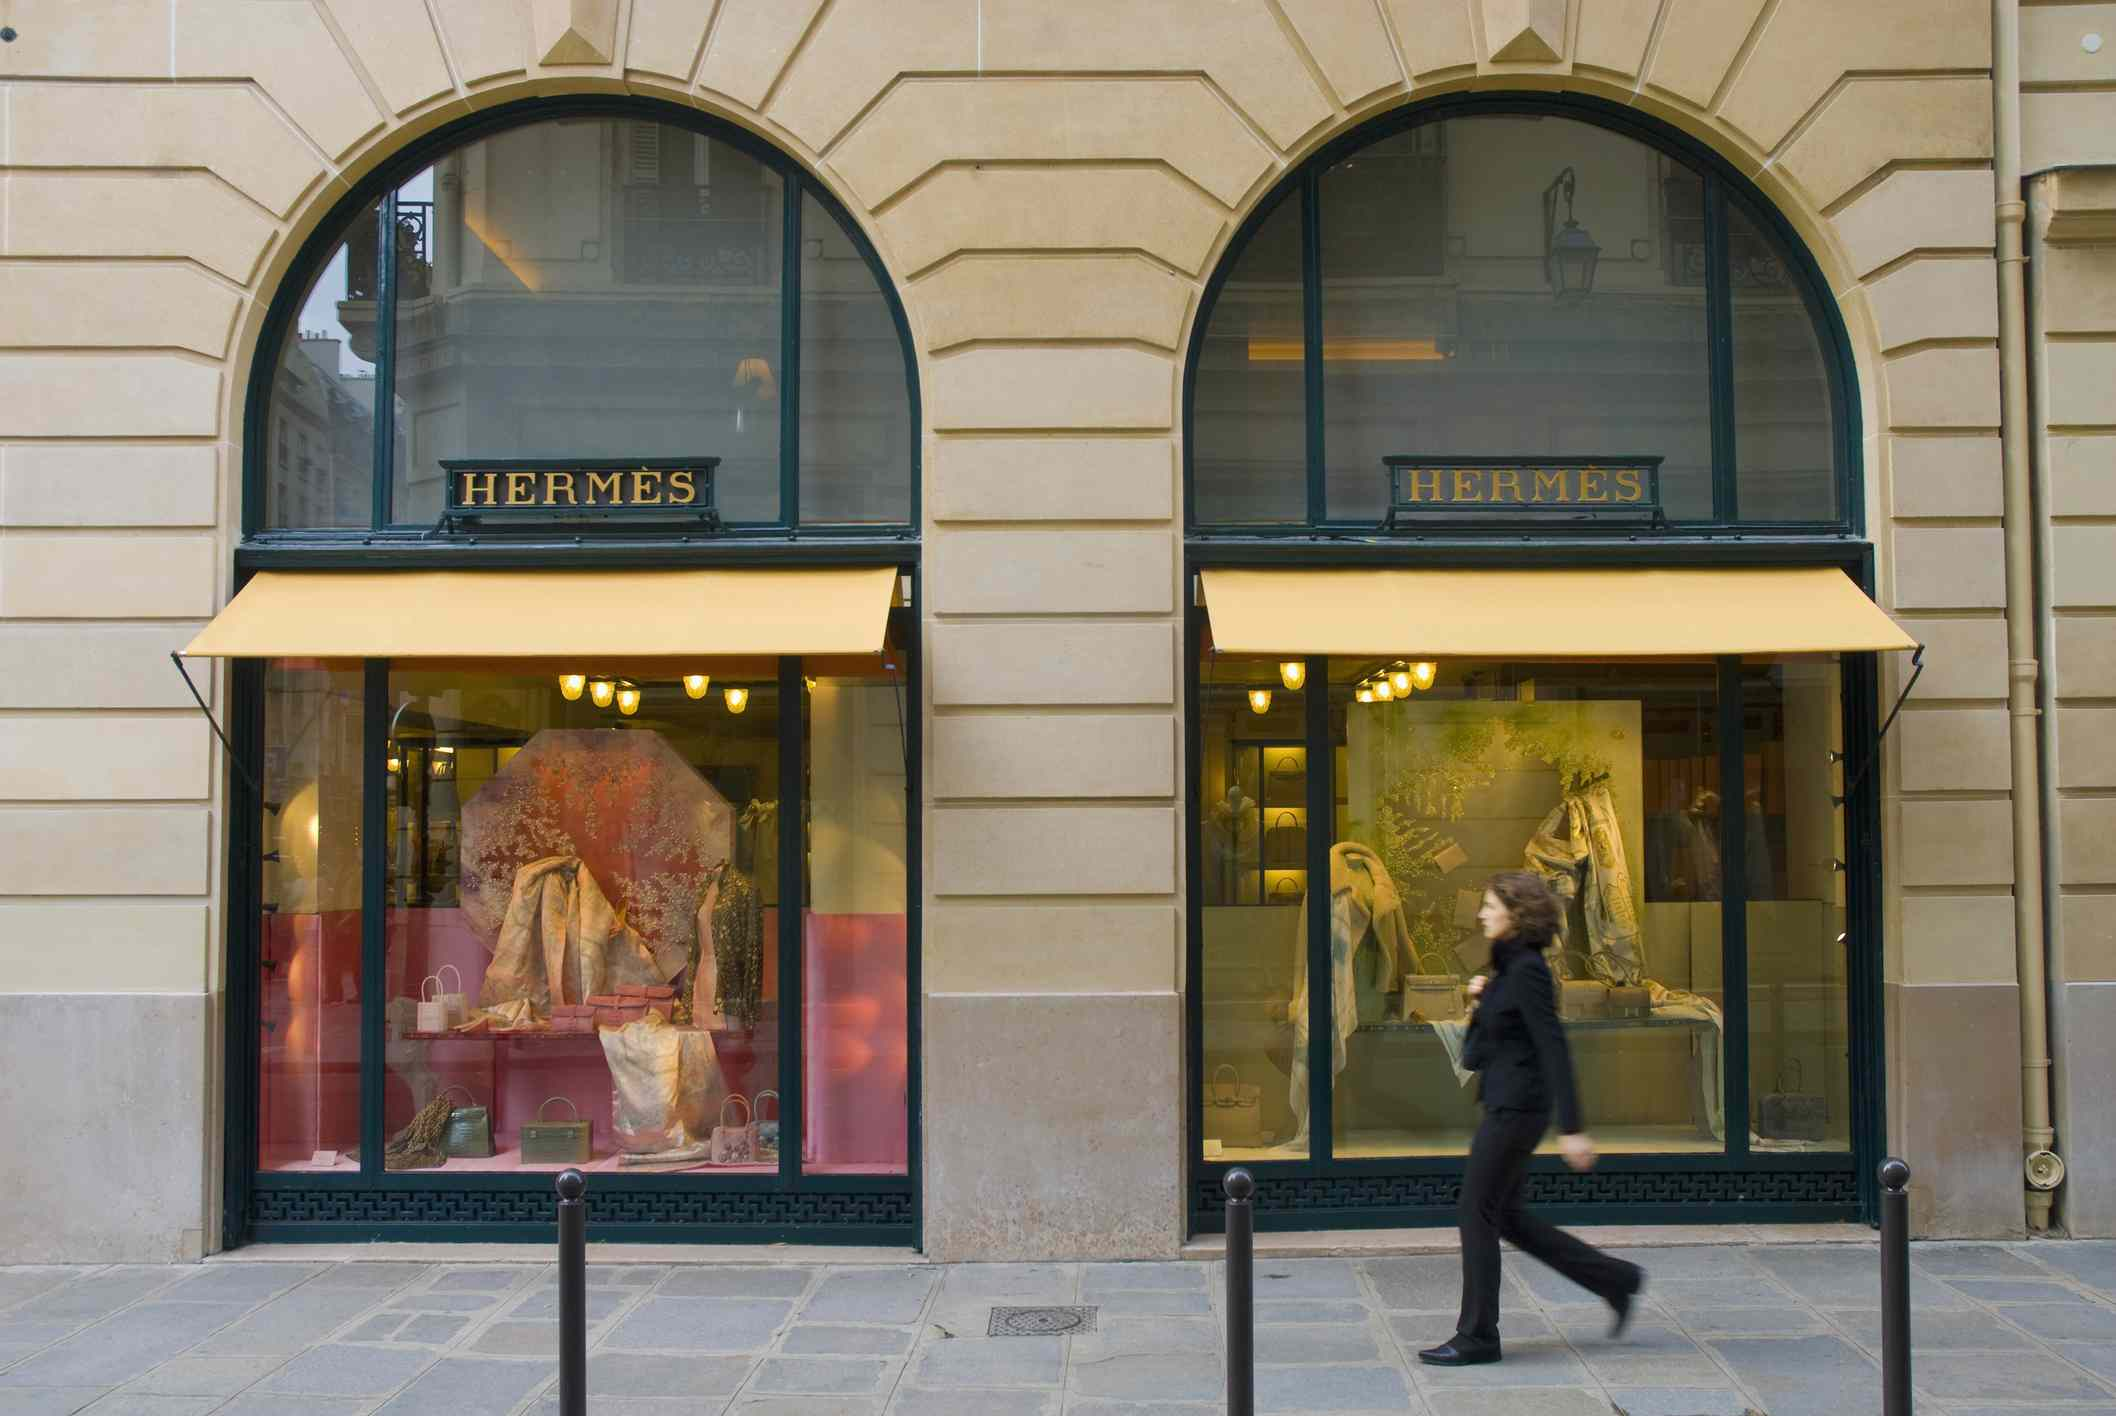 Rue St Honoré is a high-end fashion district in Paris.